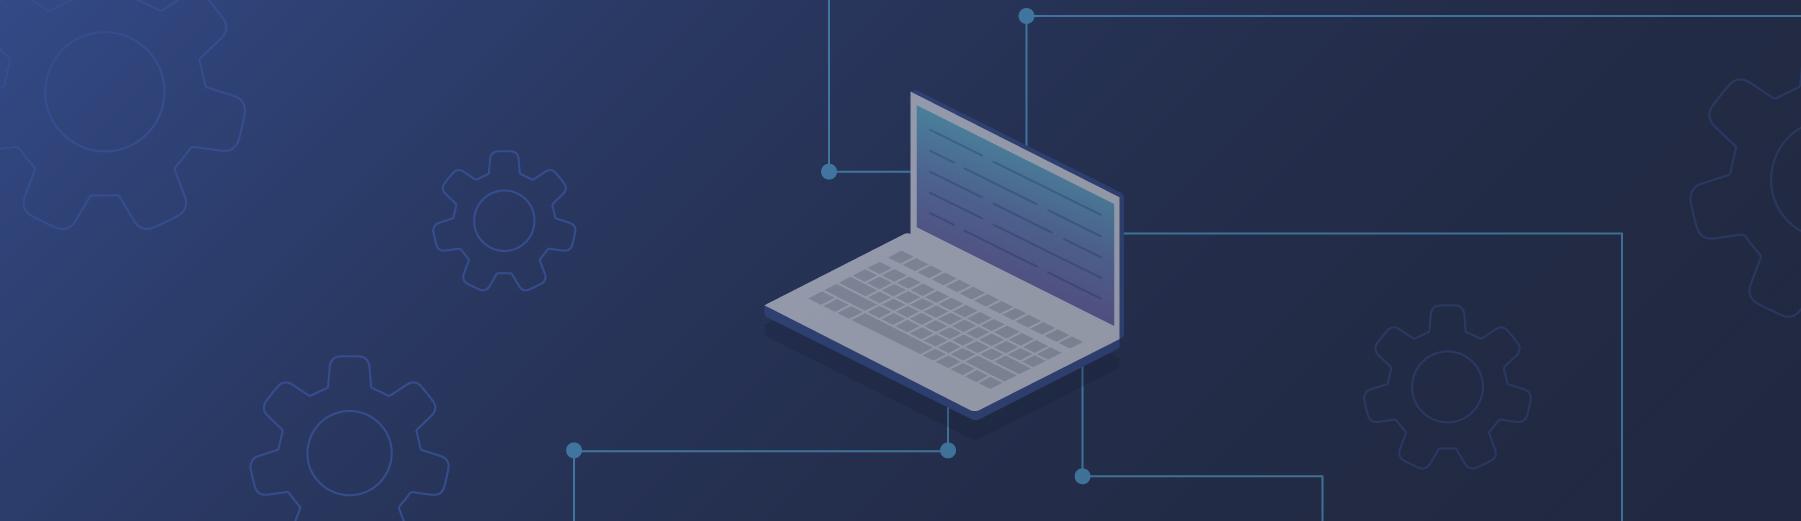 8 software marketing strategies that work (ebook) | Brafton